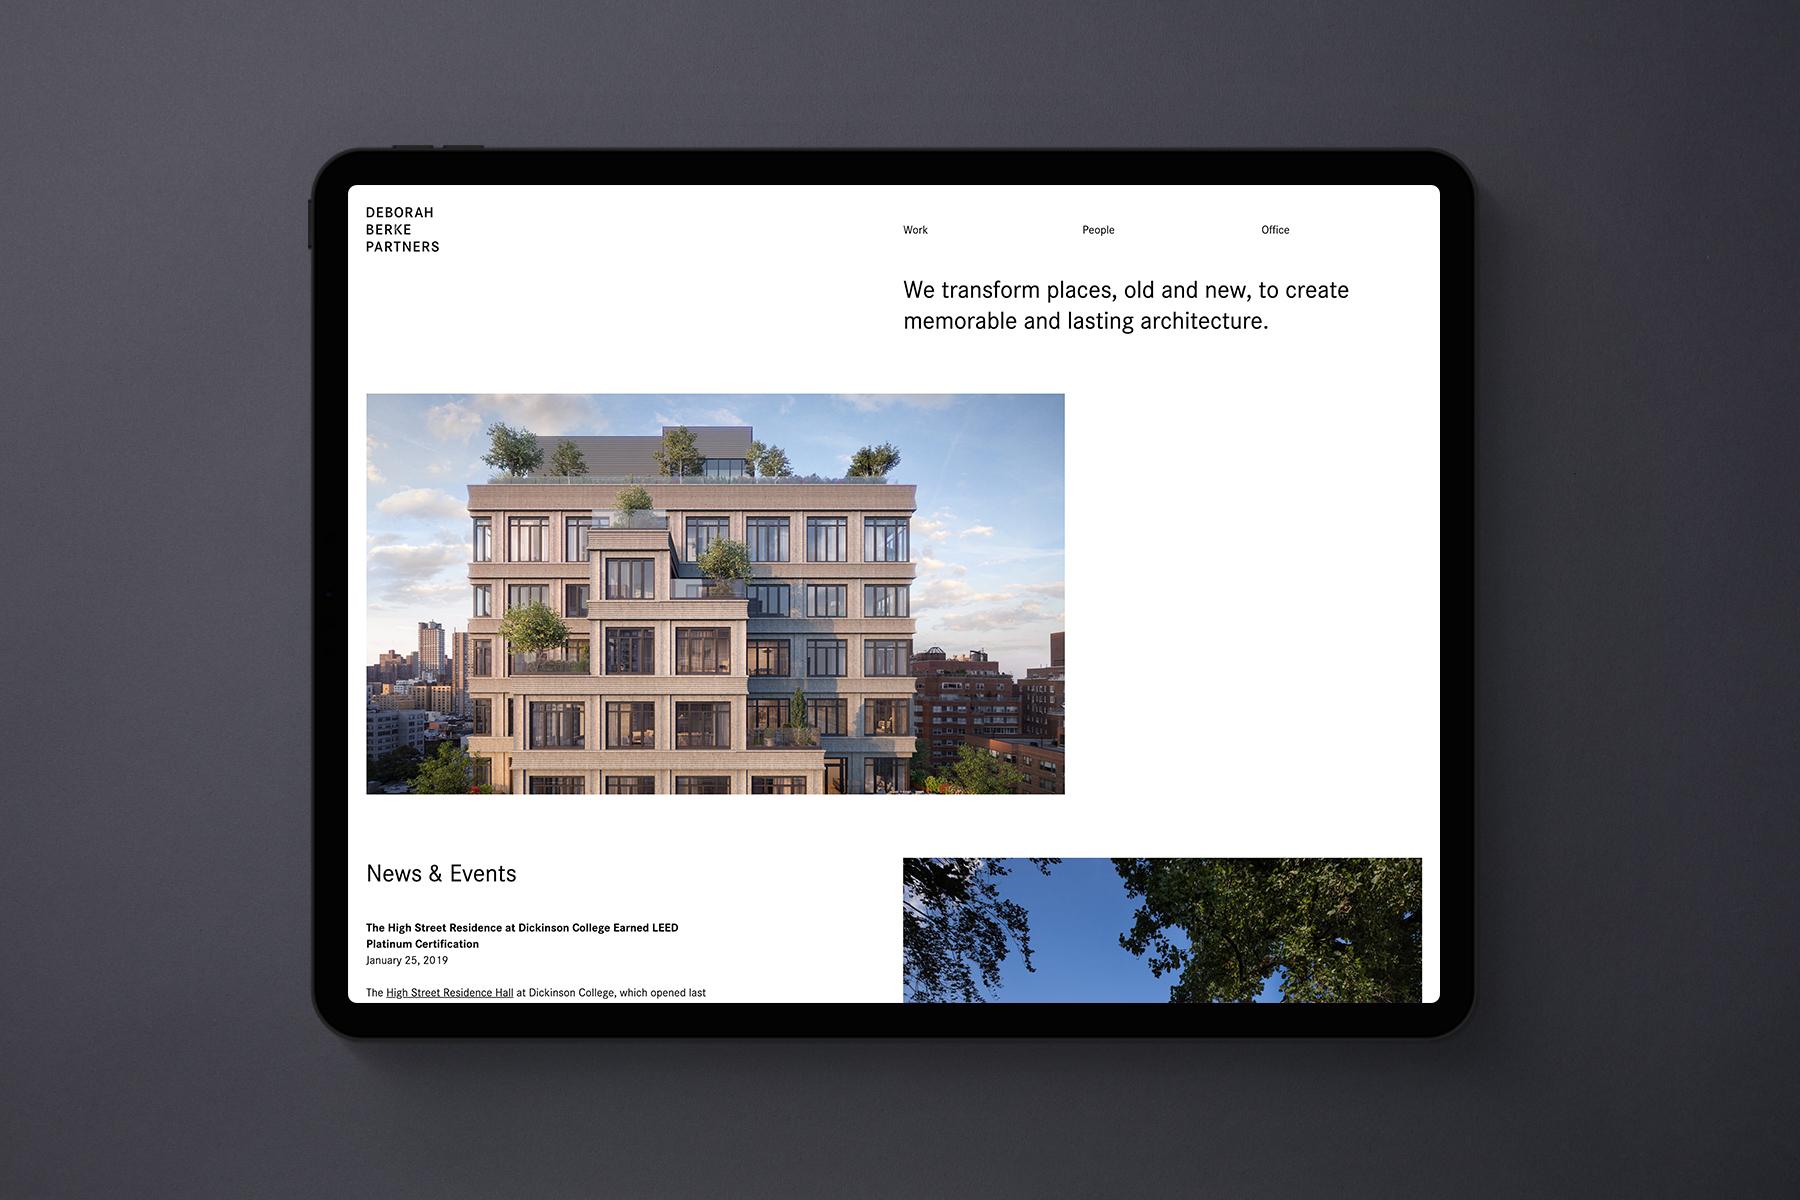 Berger-Fohr-Deborah-Berke-Partners-Web-Home.jpg